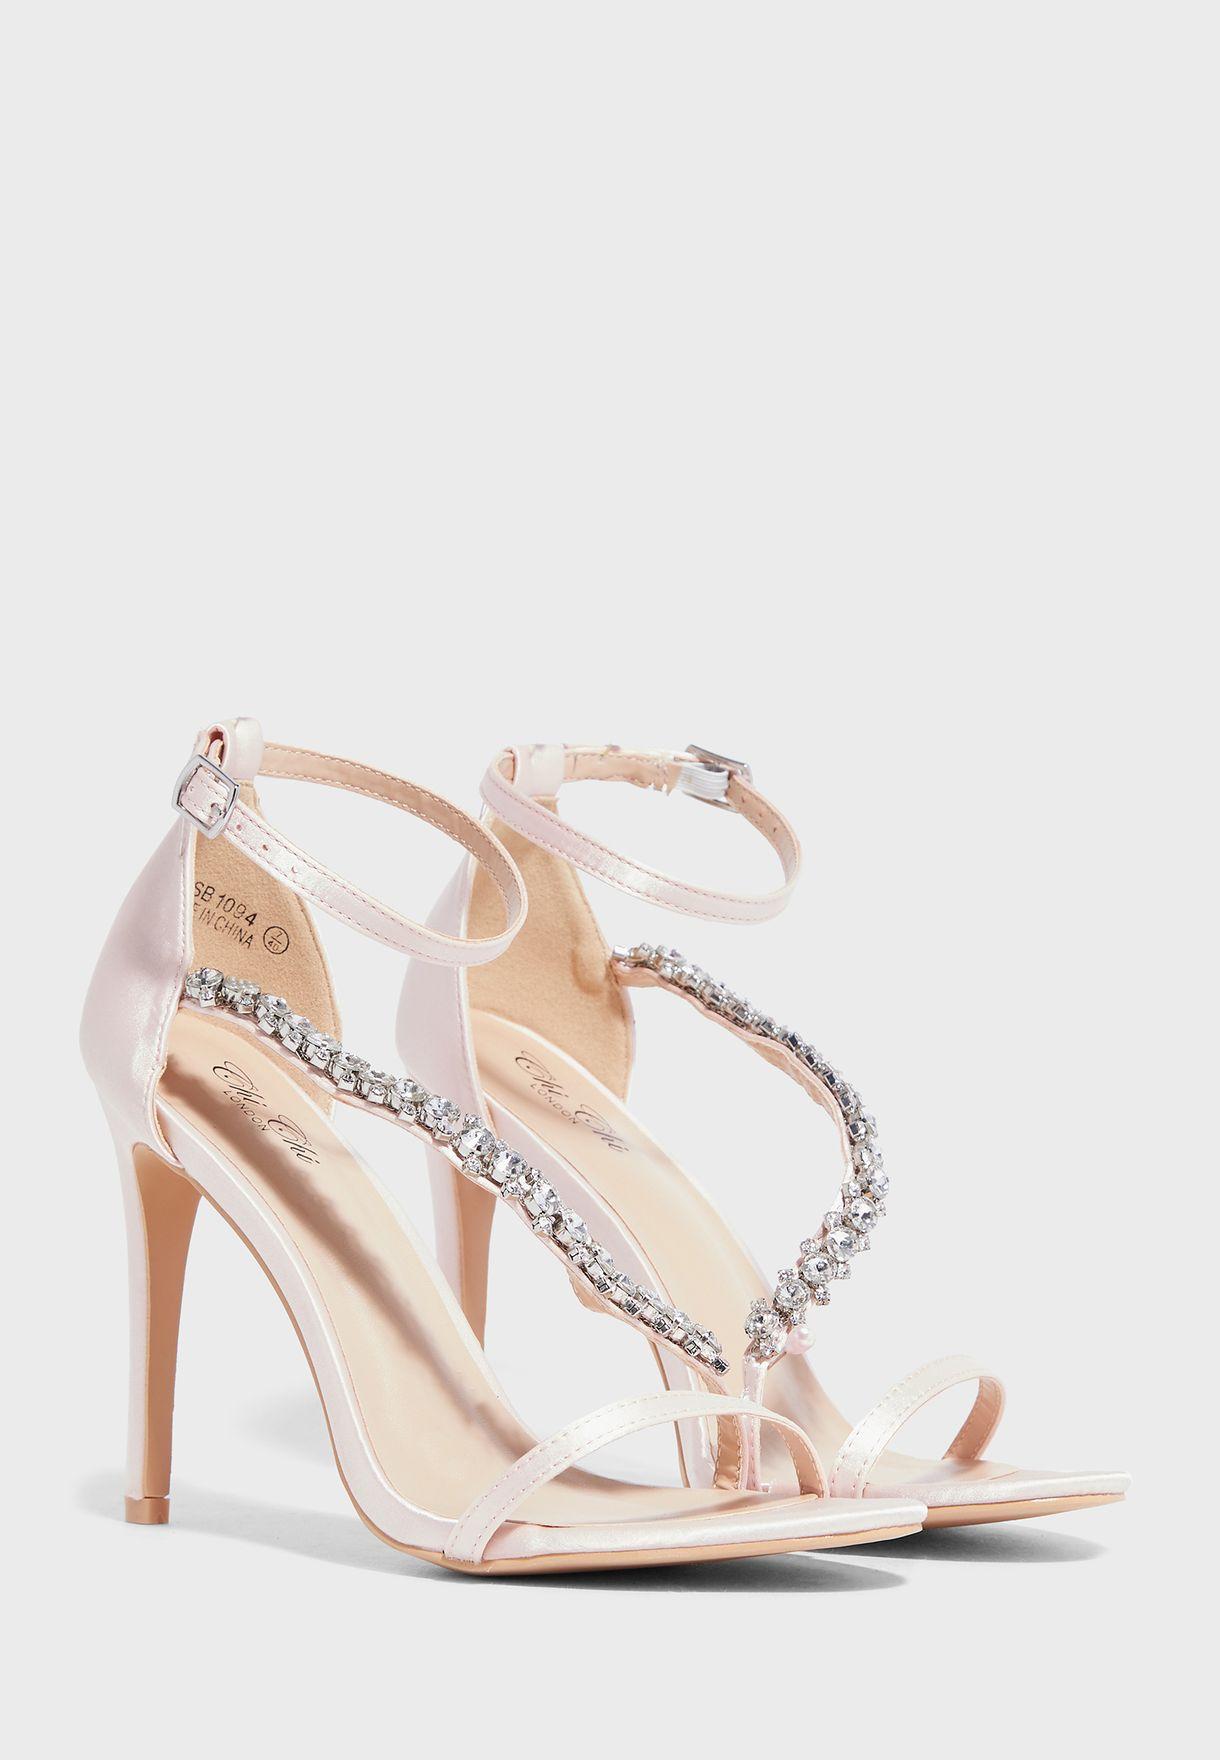 Ankle Strap High Heel Sandal